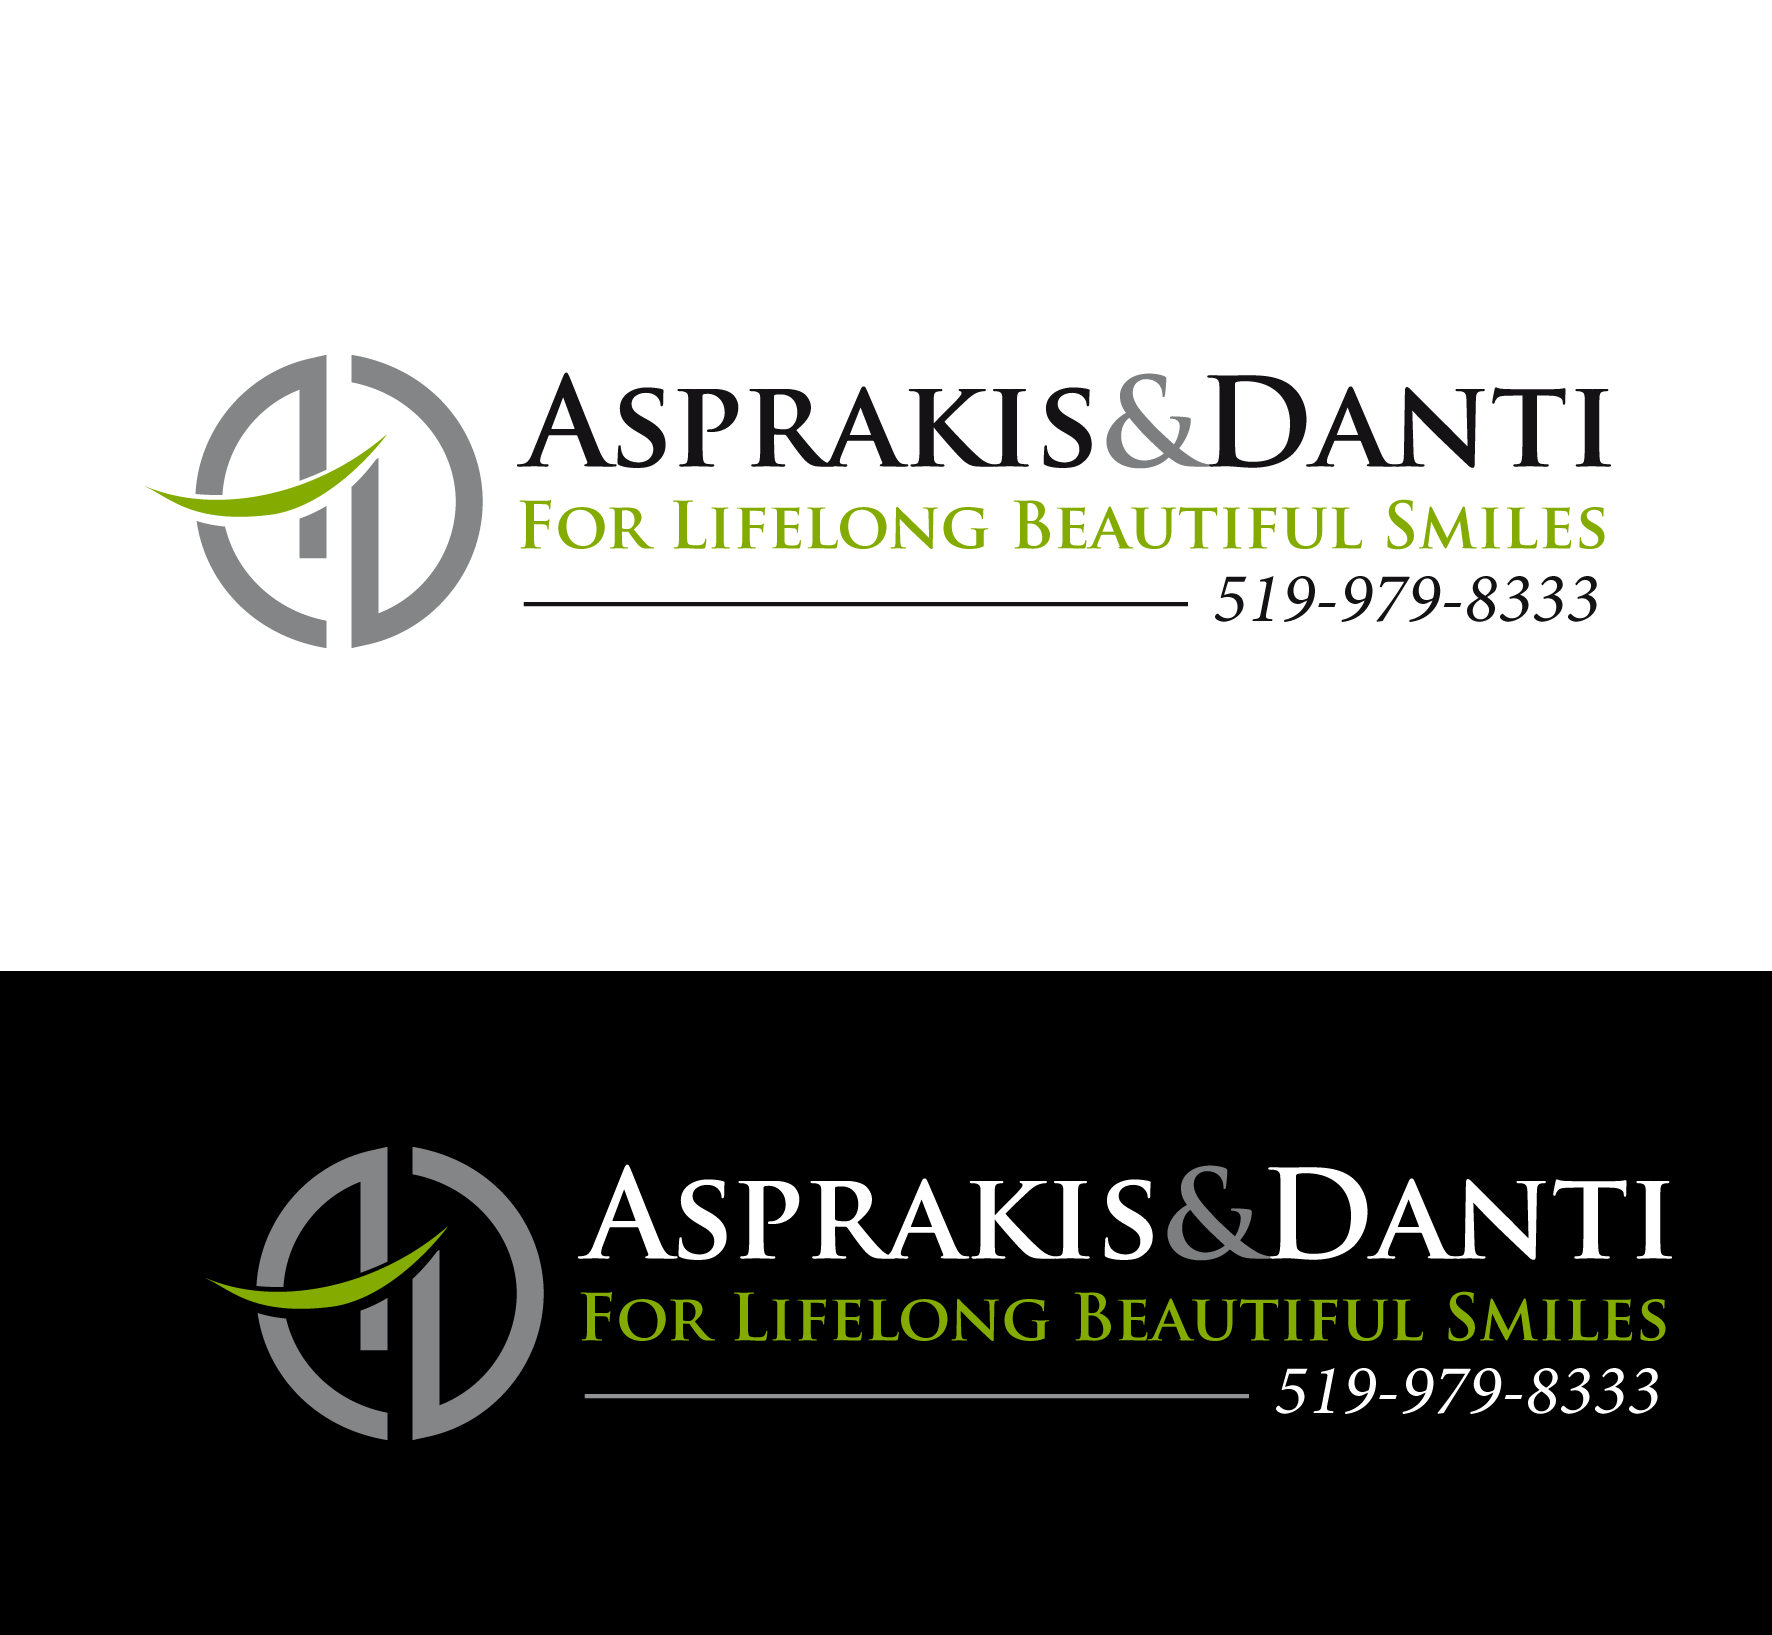 Logo Design by luna - Entry No. 79 in the Logo Design Contest Unique Logo Design Wanted for Asprakis and Danti.